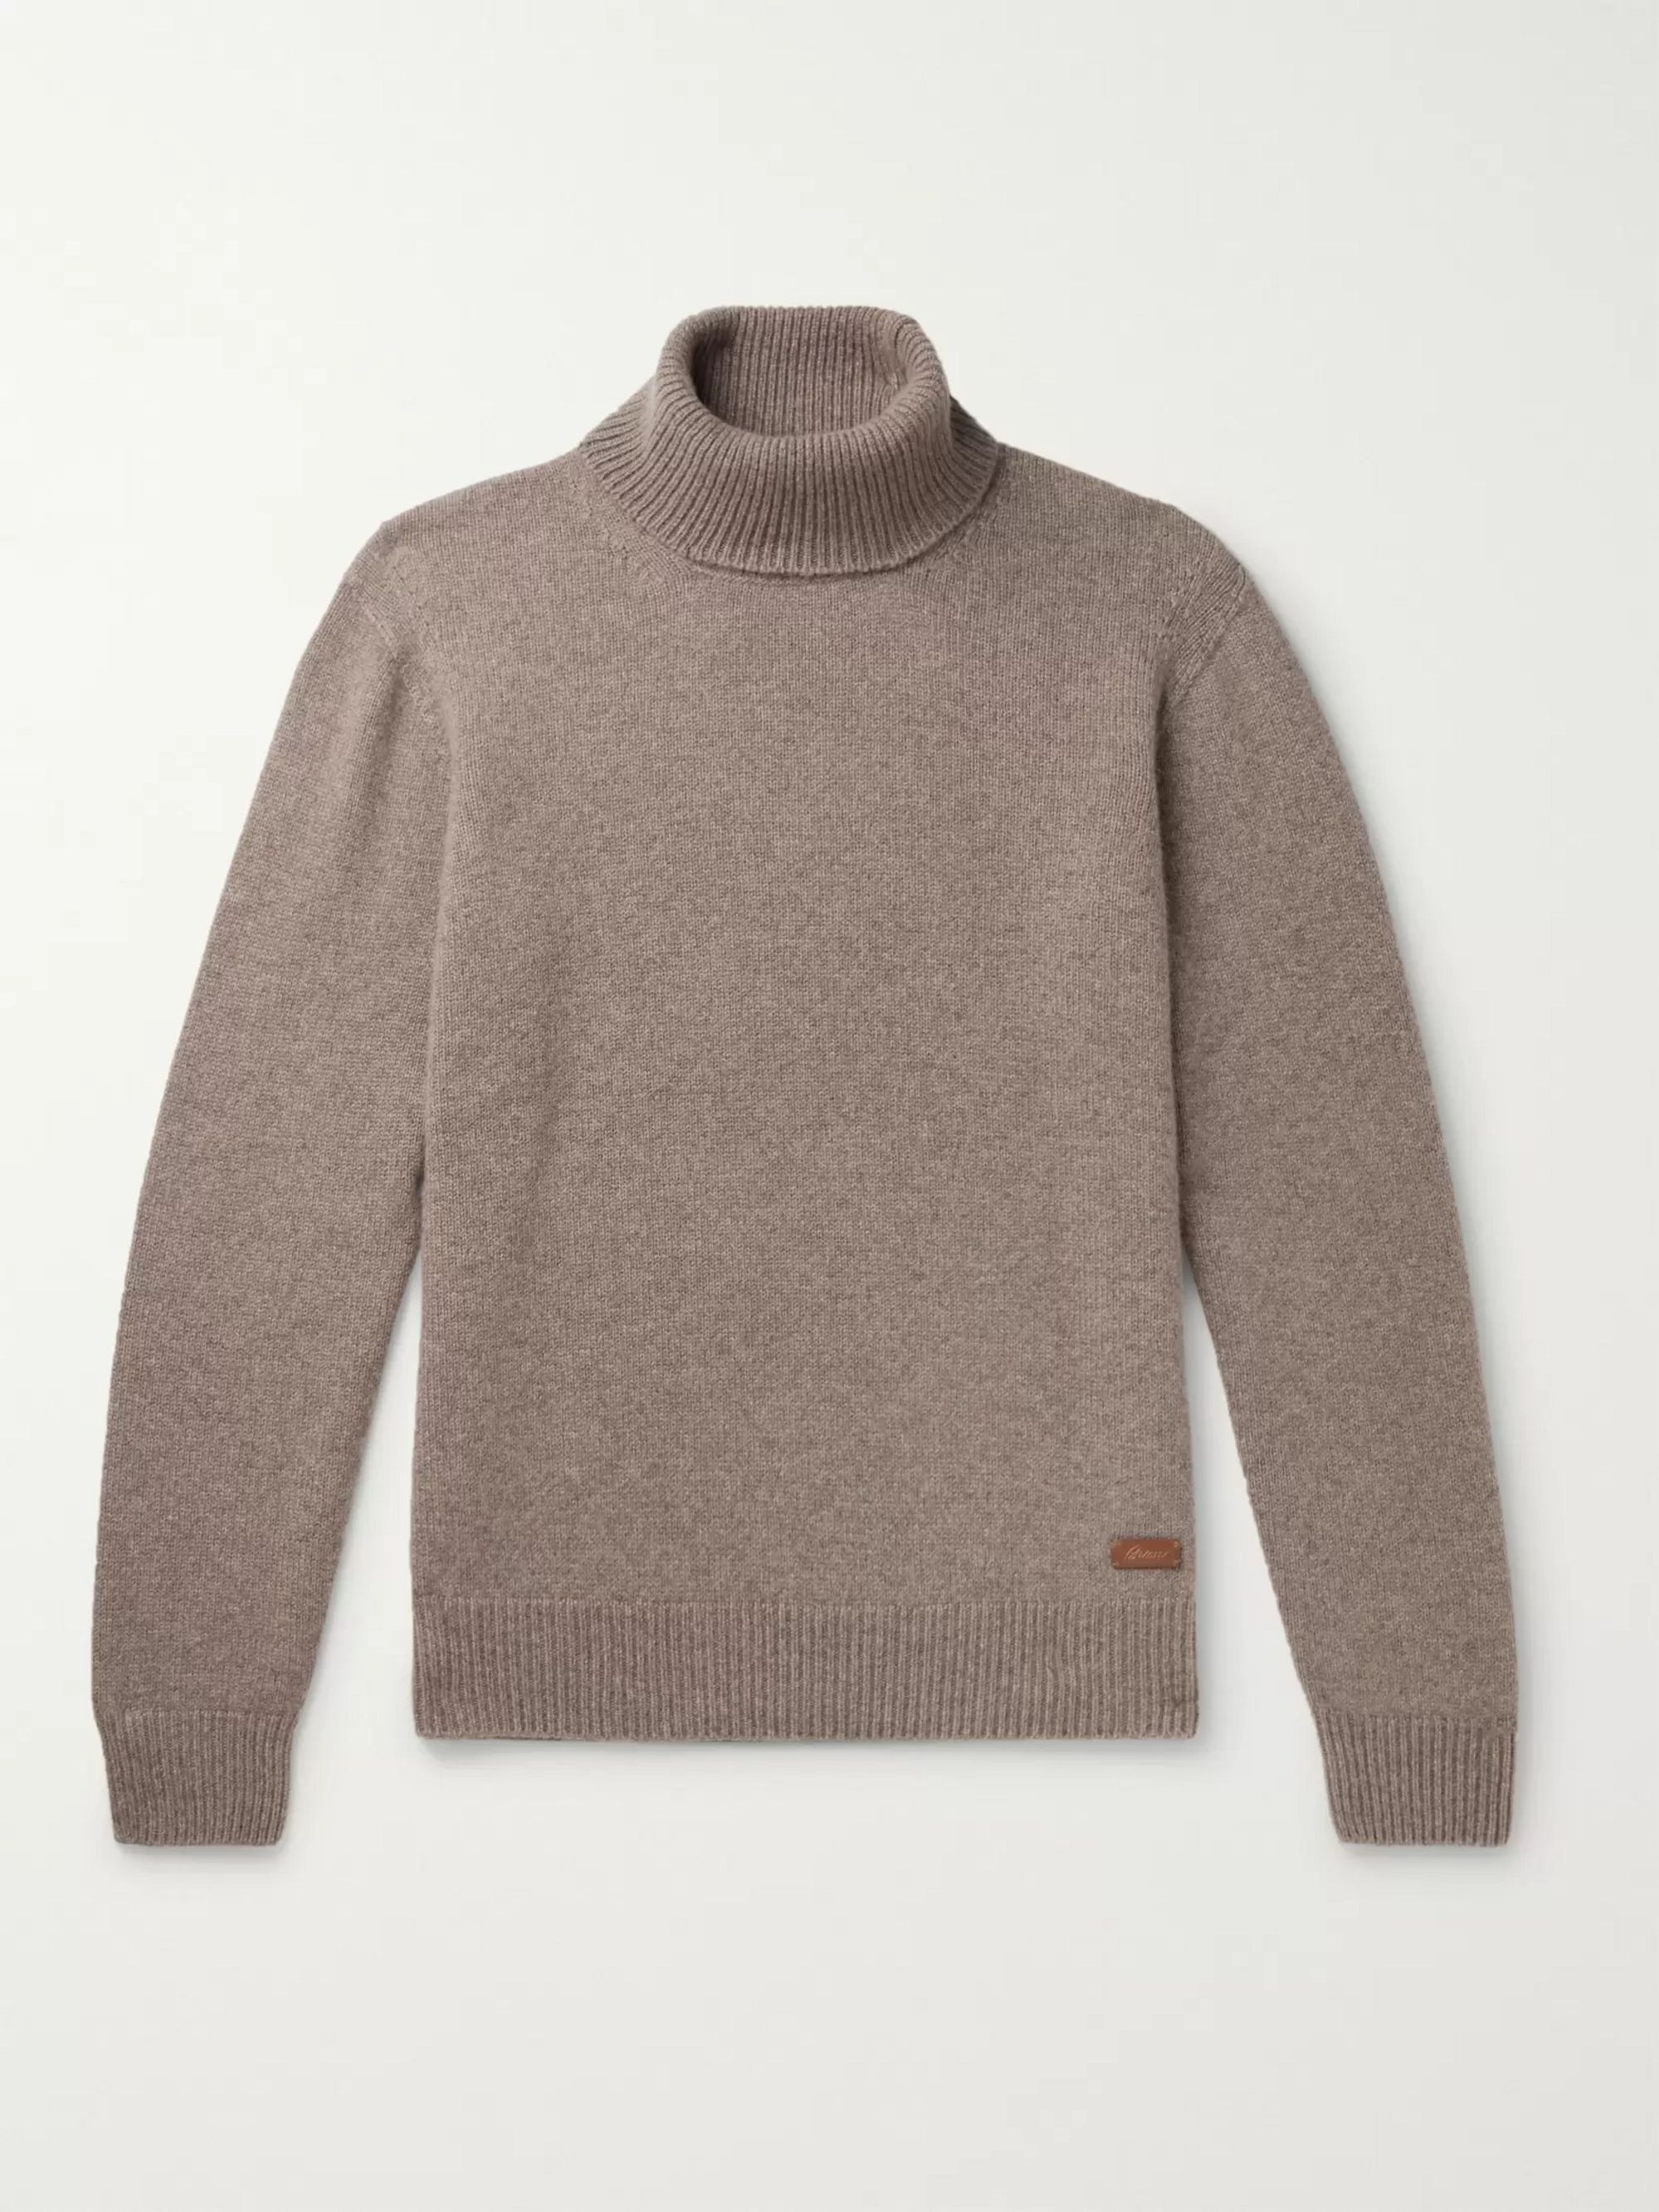 9faef0a8 Logo-Appliquéd Cashmere Rollneck Sweater